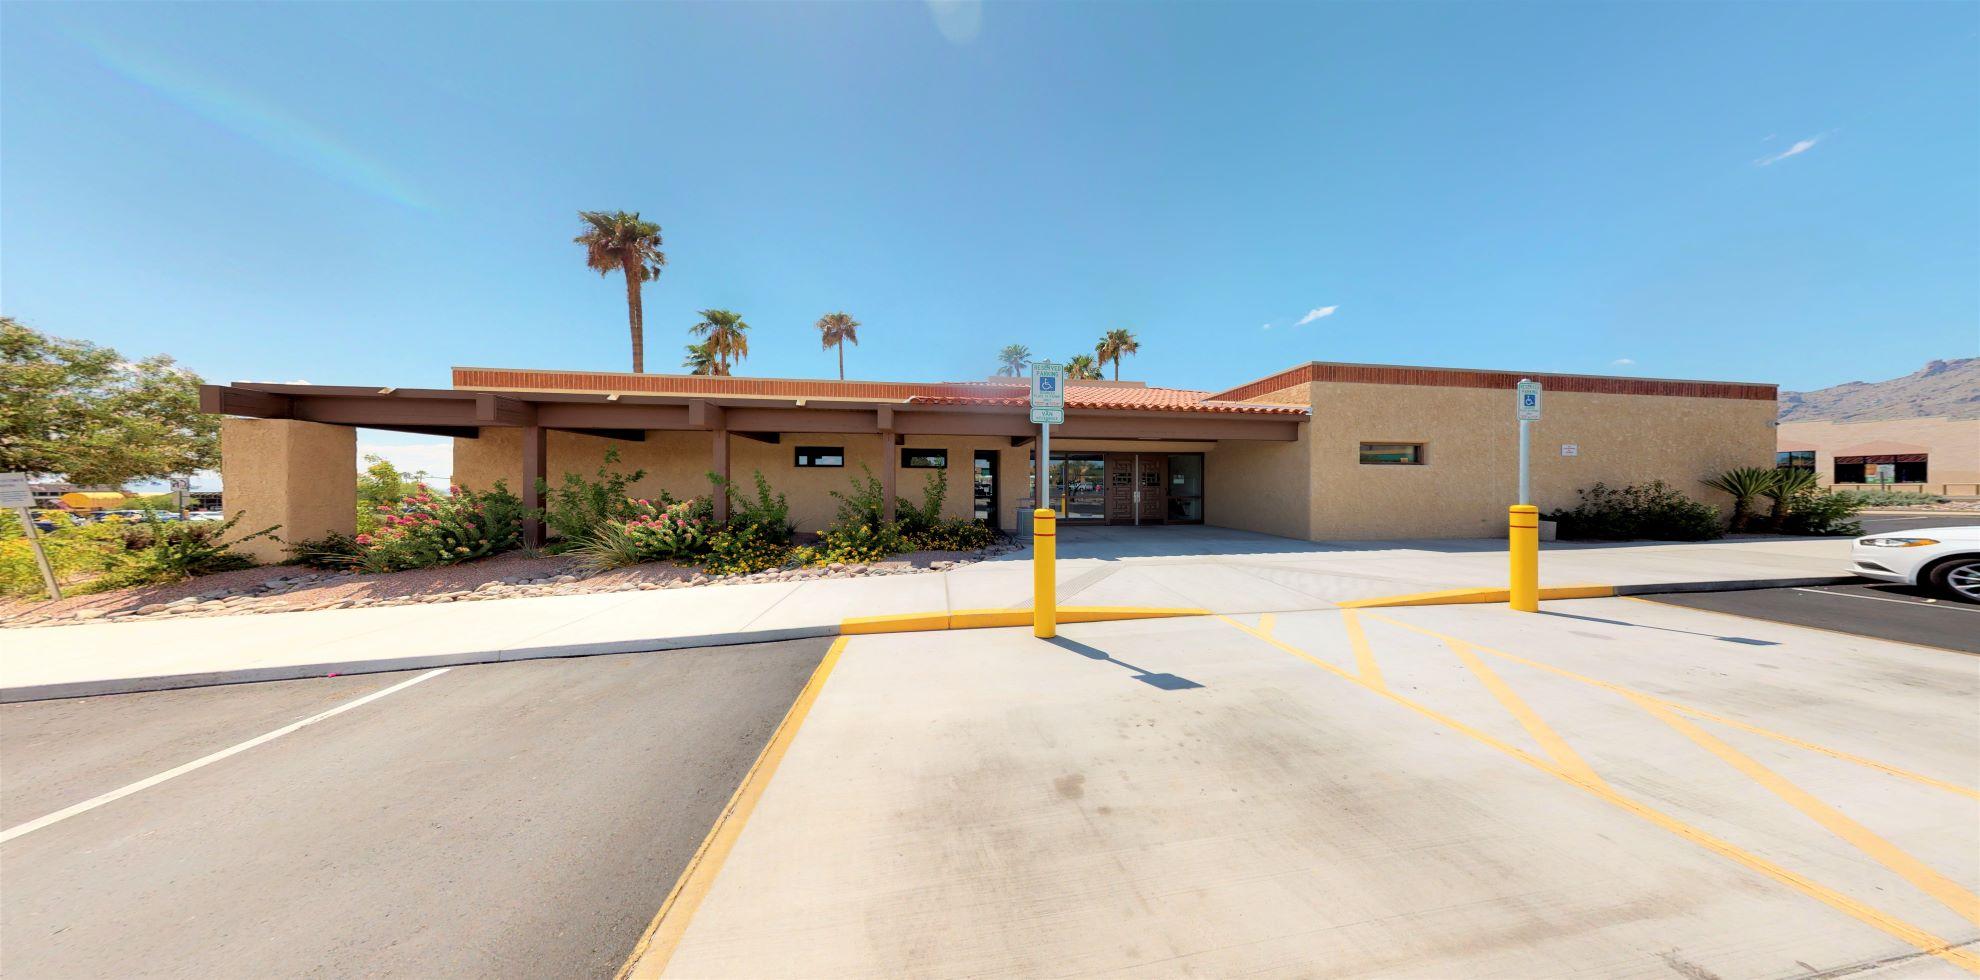 Bank of America financial center with drive-thru ATM | 5610 N Swan Rd, Tucson, AZ 85718